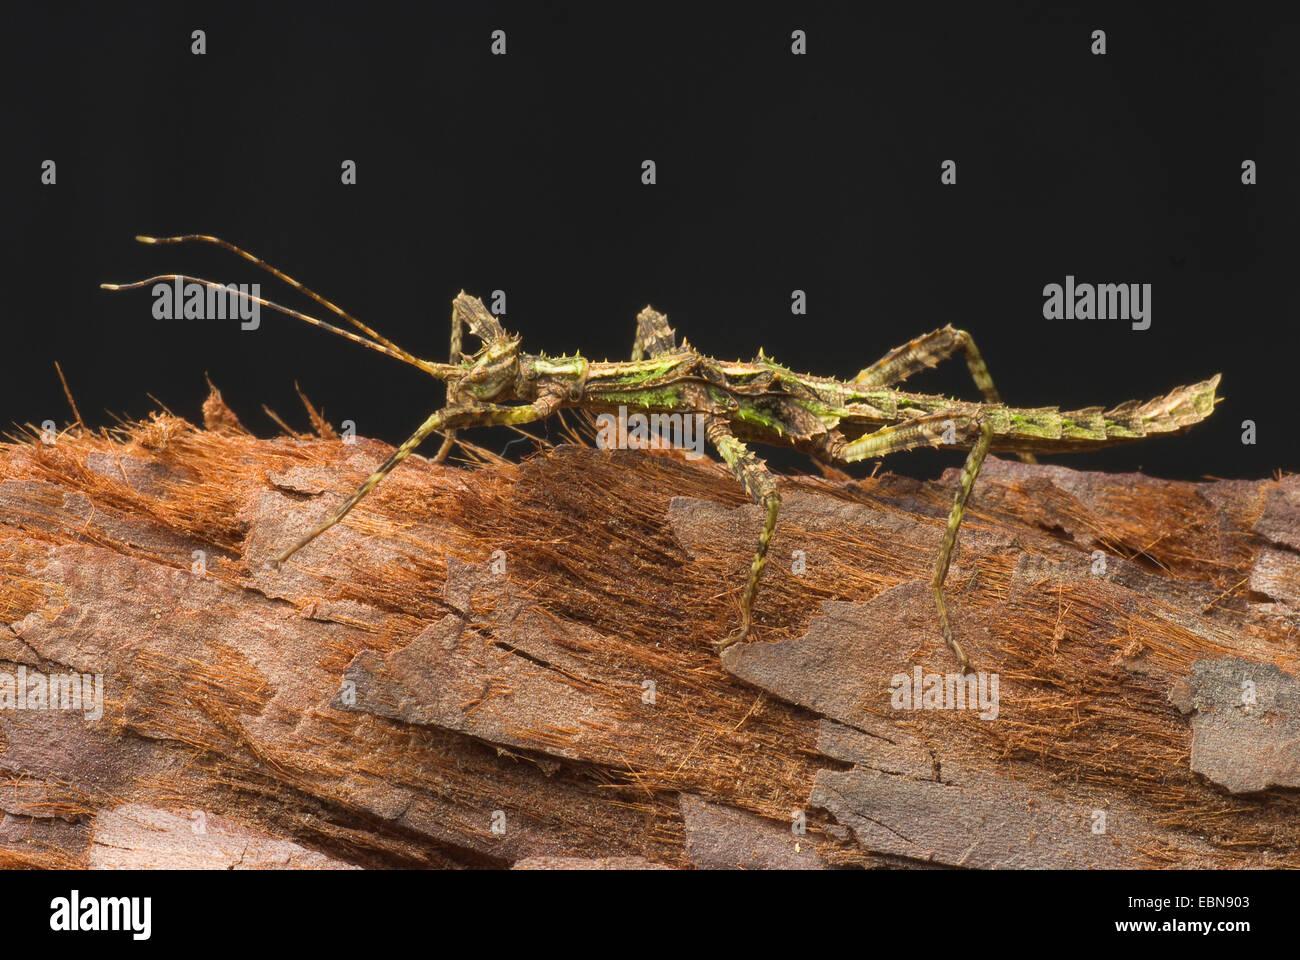 Phasme épineux géant (Trachyaretaon brueckneri carmelae, Trachyaretaon), sur l'écorce Photo Stock